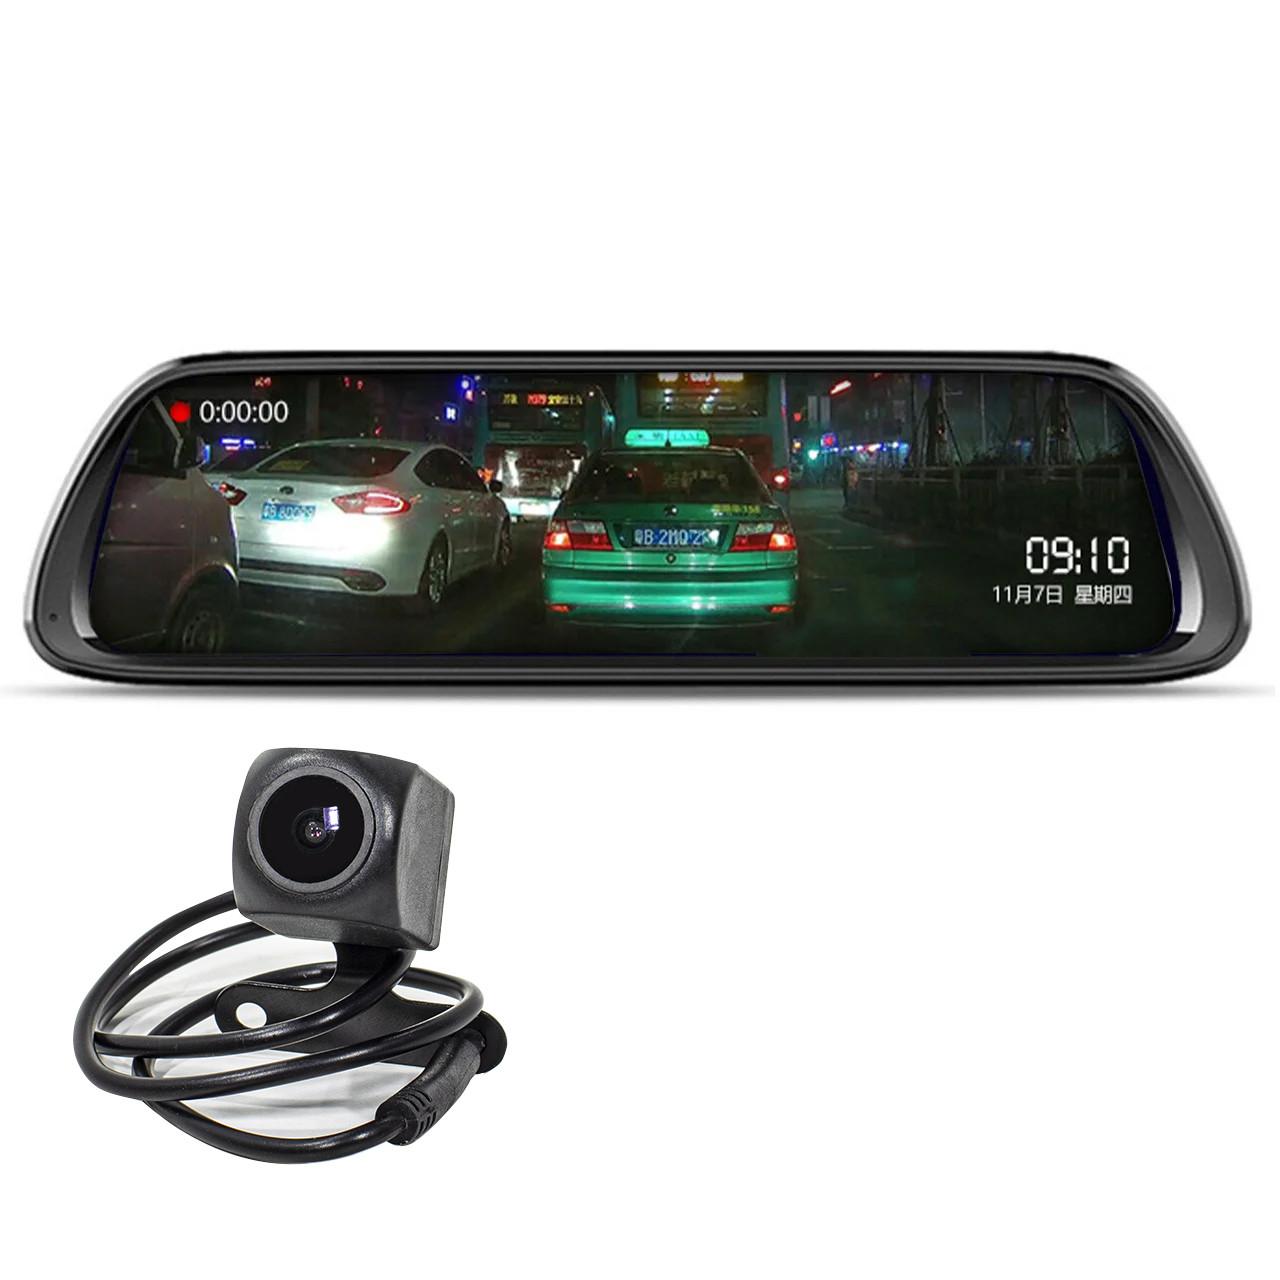 "Зеркало видеорегистратор 10"" Lesko Car K62 для авто ночная съемка камера заднего вида 1080P функция WDR"